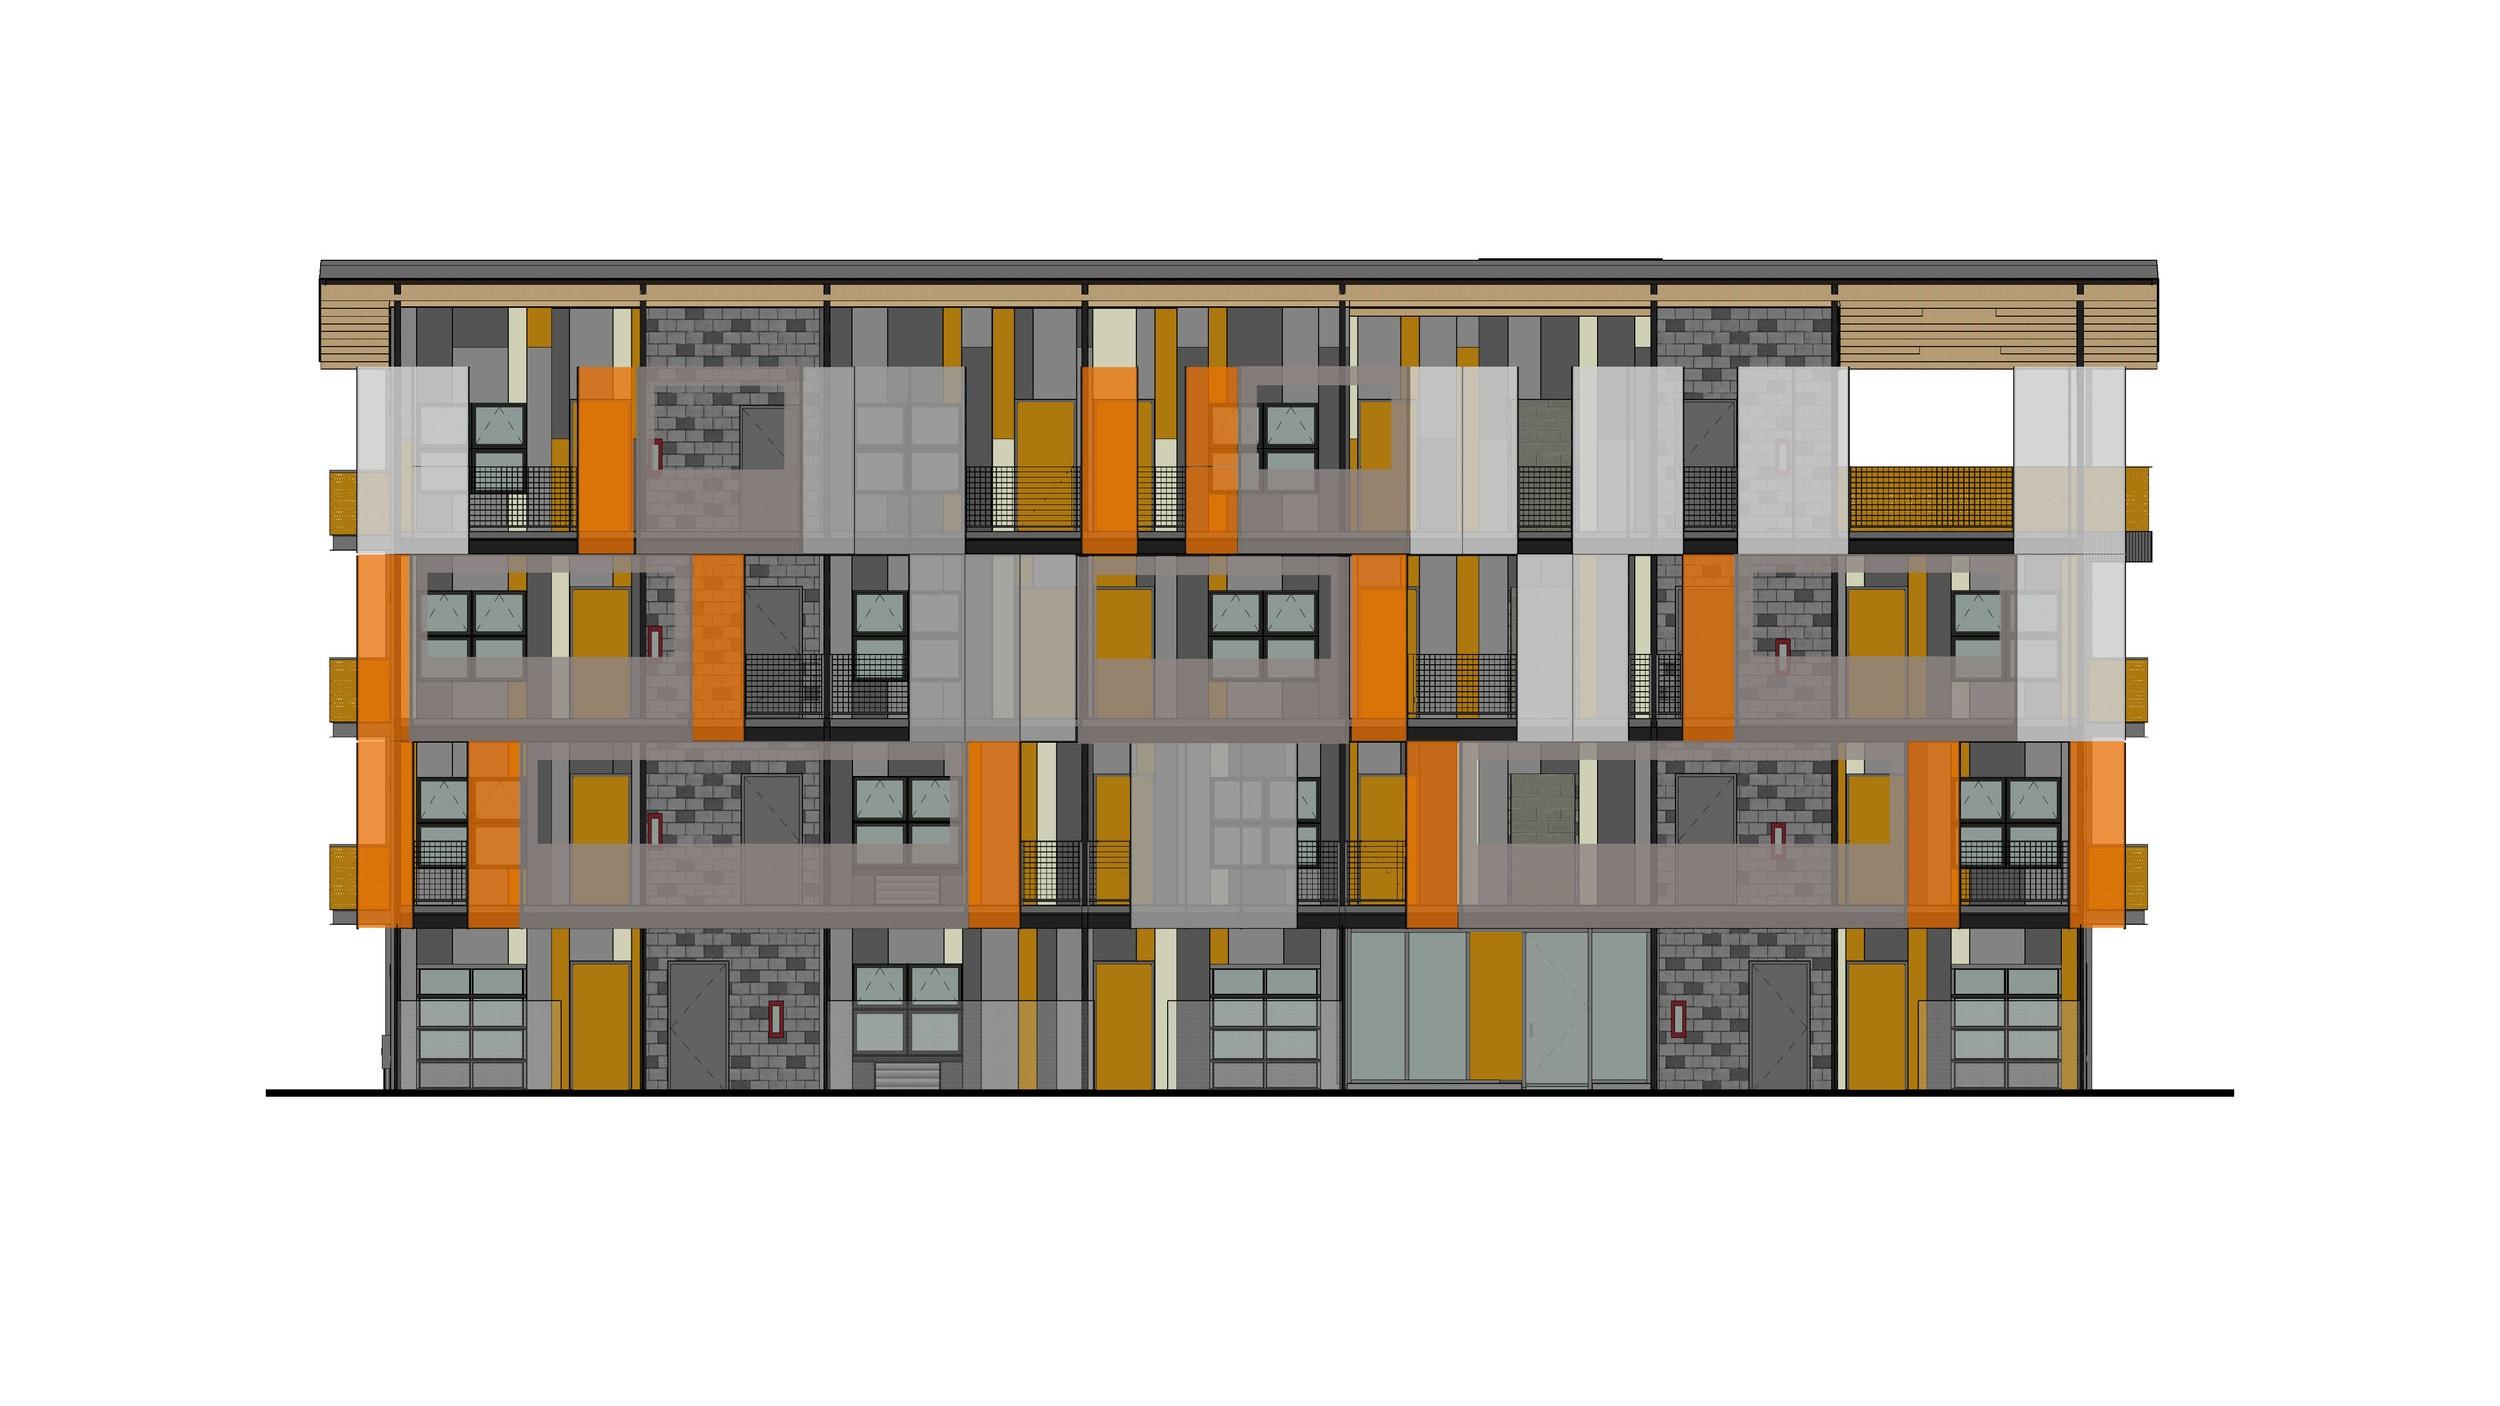 BUILDING+I+-+SCREEN+ELEVATION+-+COLOR+OPTIONS_grace+2.jpg